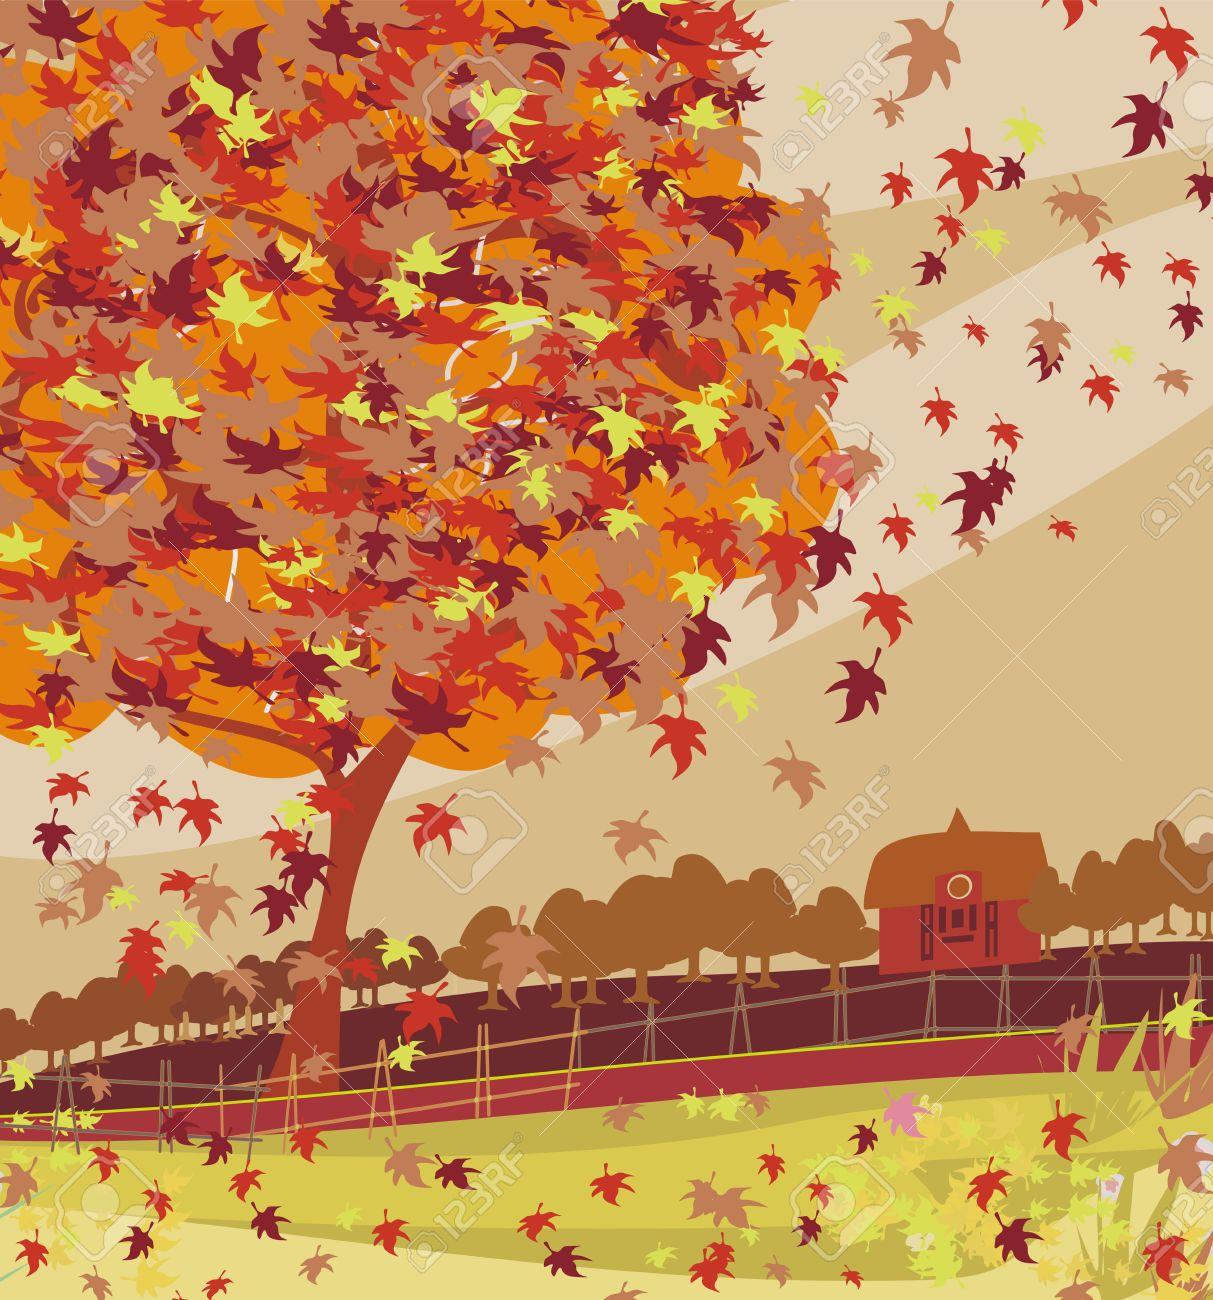 Autumn rural landscape illustration - 22269570